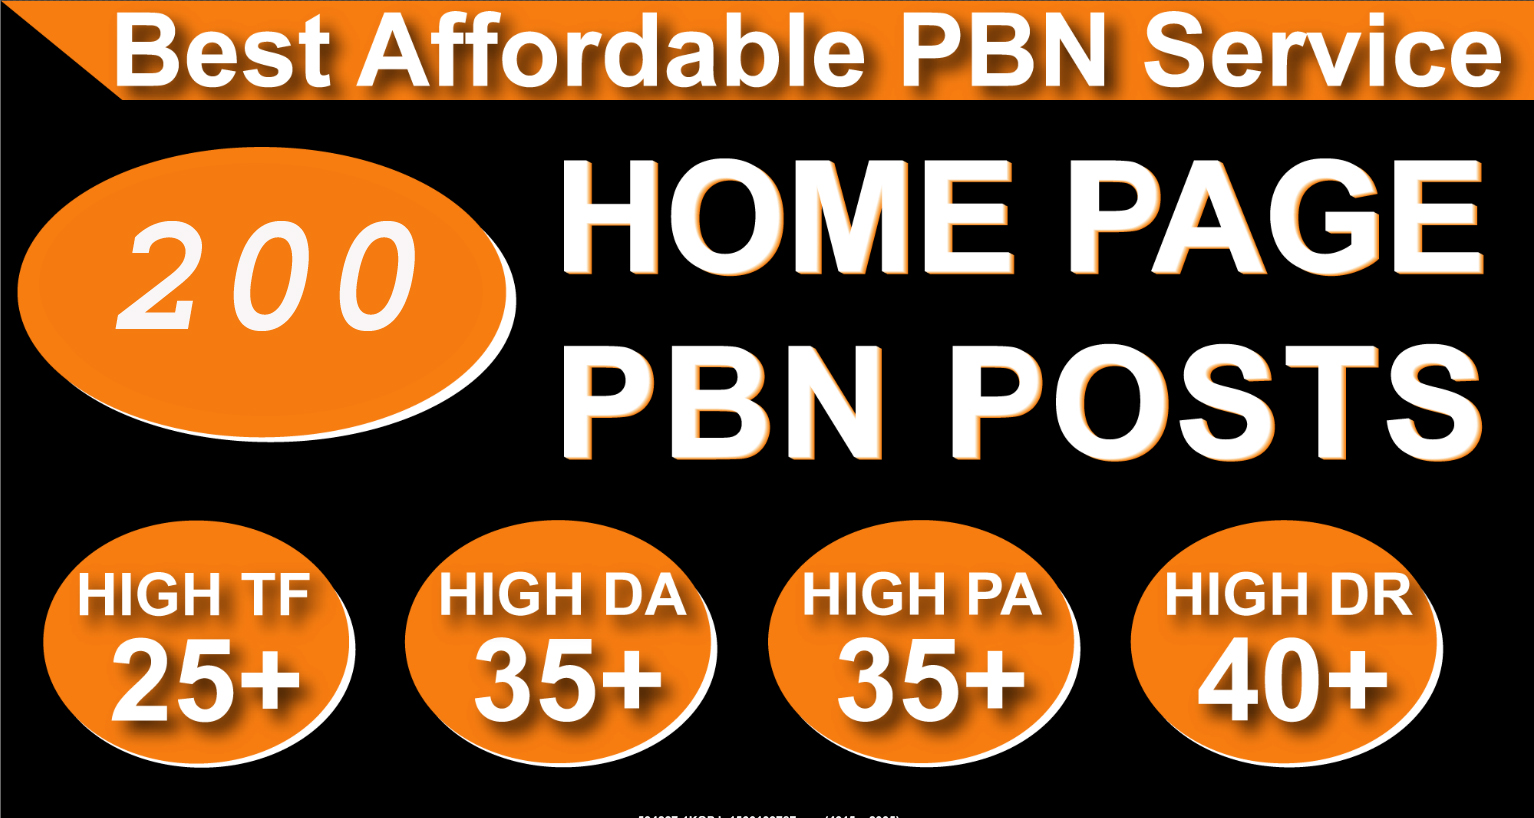 Homepage 200 PBN High FT 25 Plus DA35 PA35 TF40